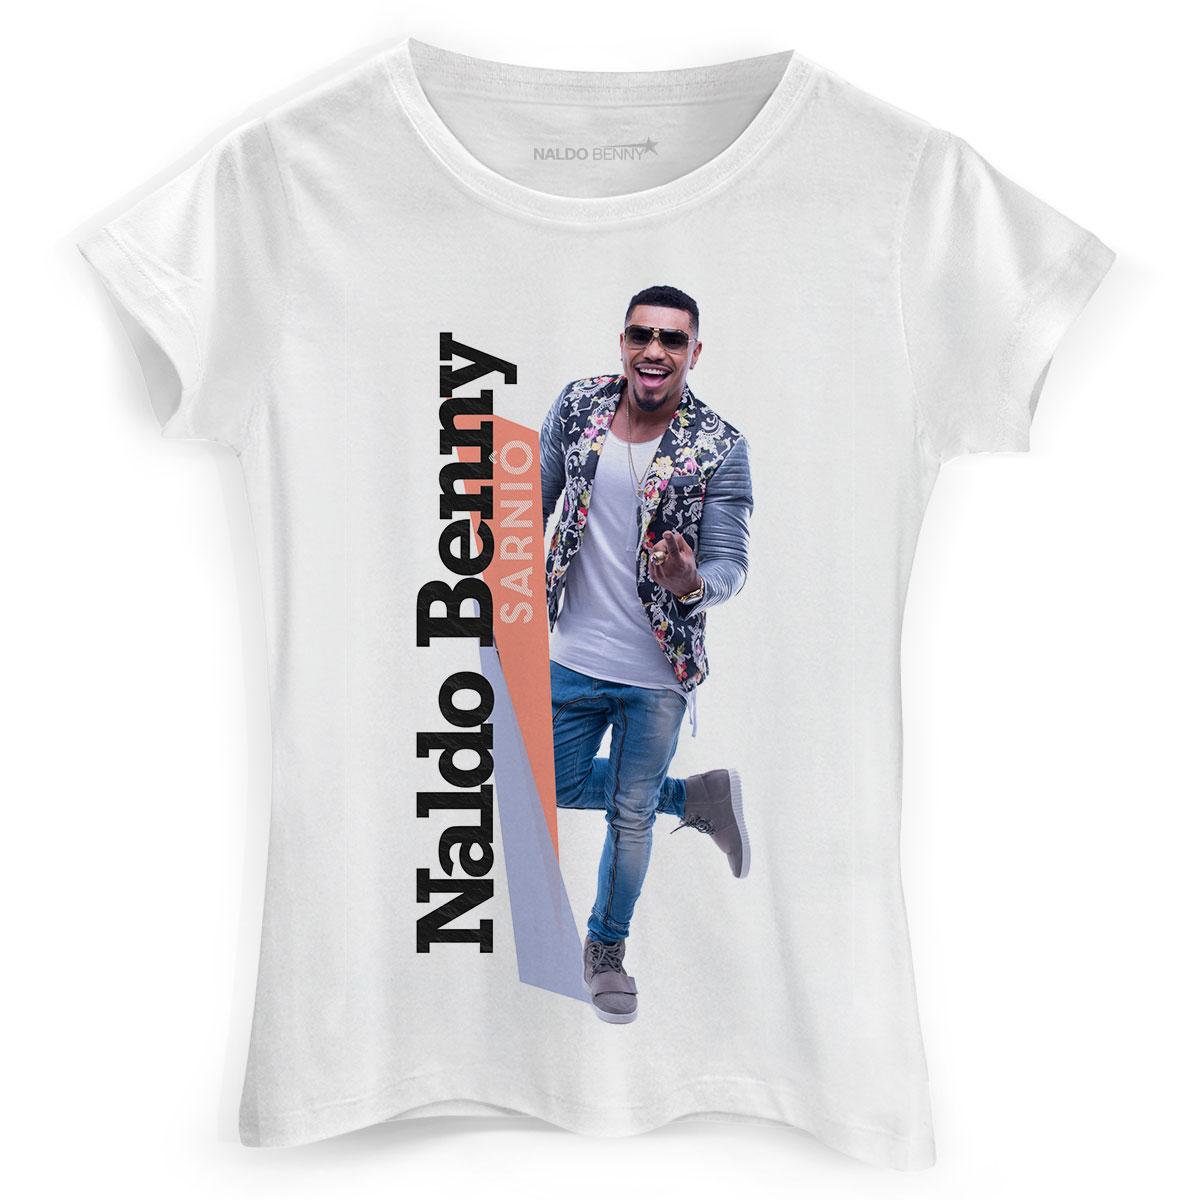 Camiseta Feminina Naldo Benny Sarniô